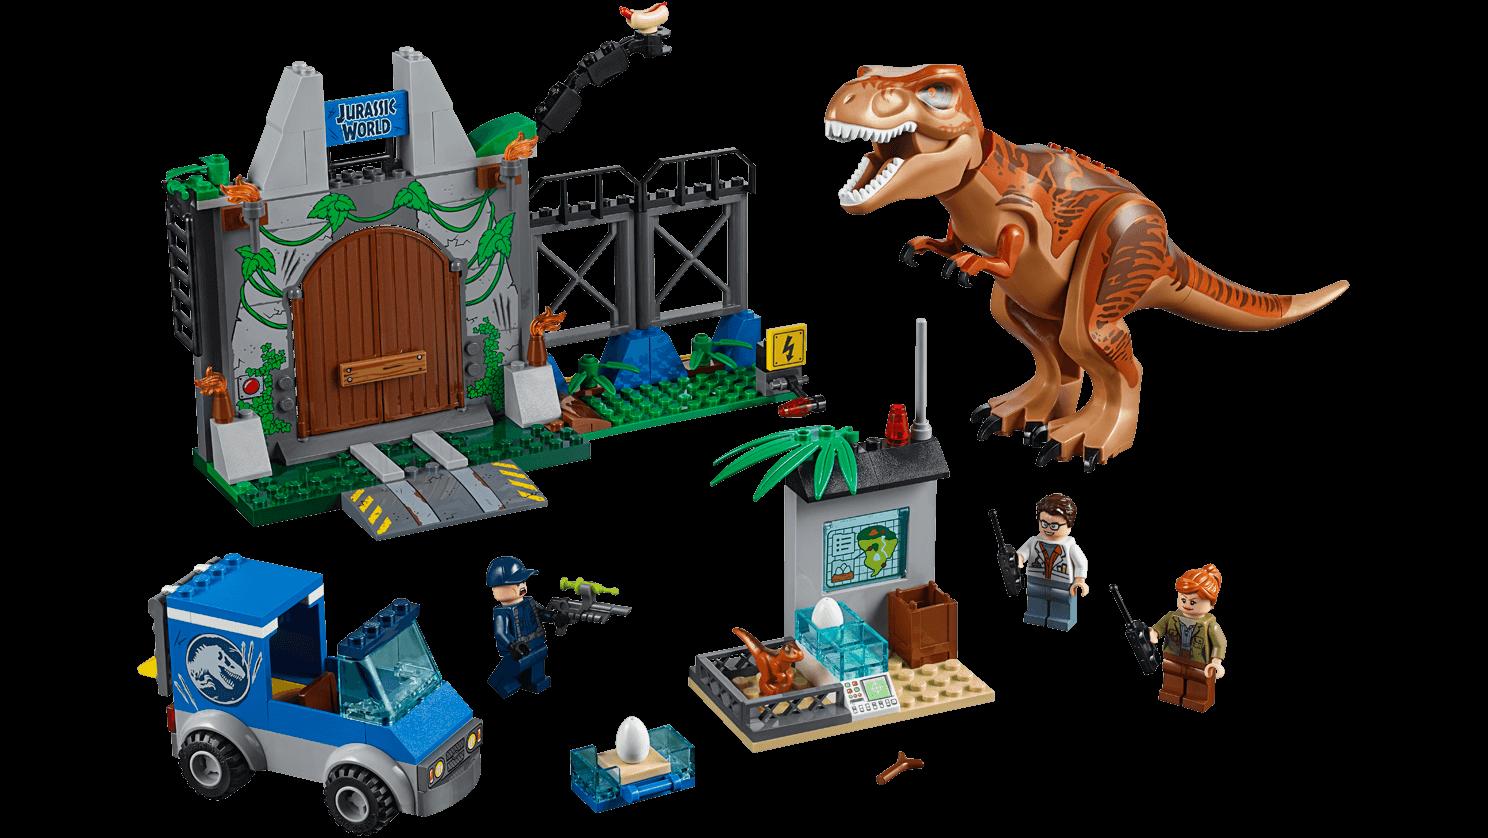 LEGO Juniors - 10758 T. rex Breakout - The set consists of three minifigures, a van, the dinosaur nursery, a dinosaur figure, a big dinosaur enclosure.